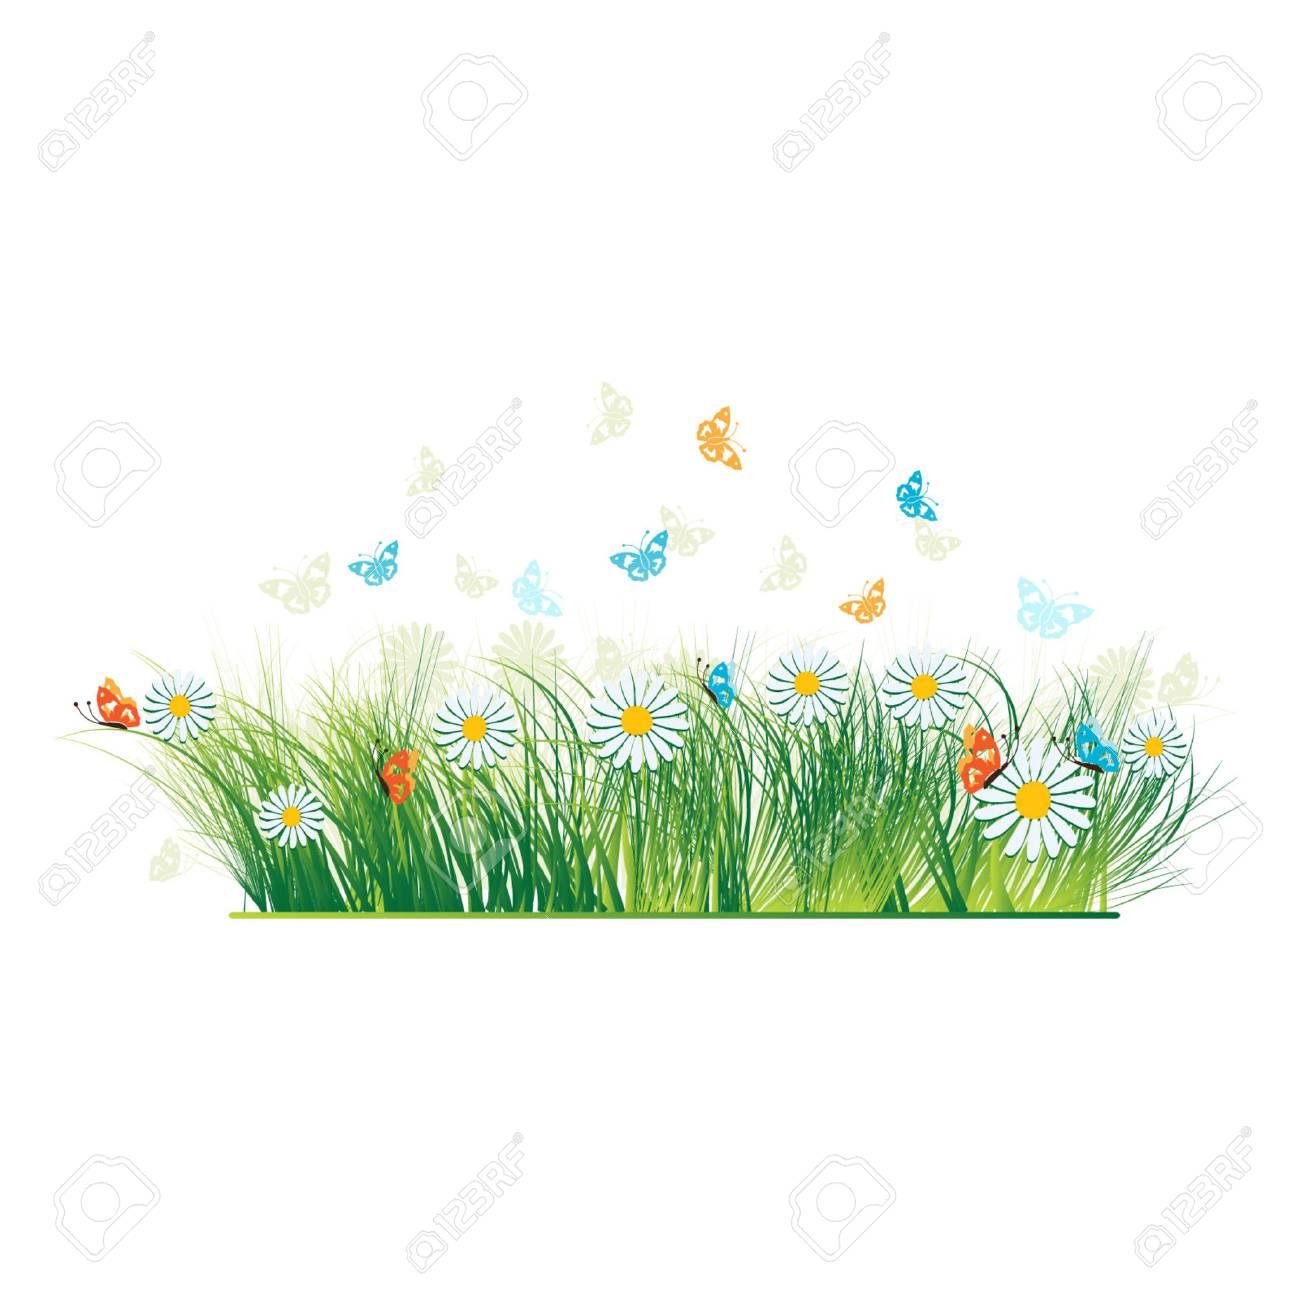 Grass silhouette green, summer background Stock Vector - 3093045